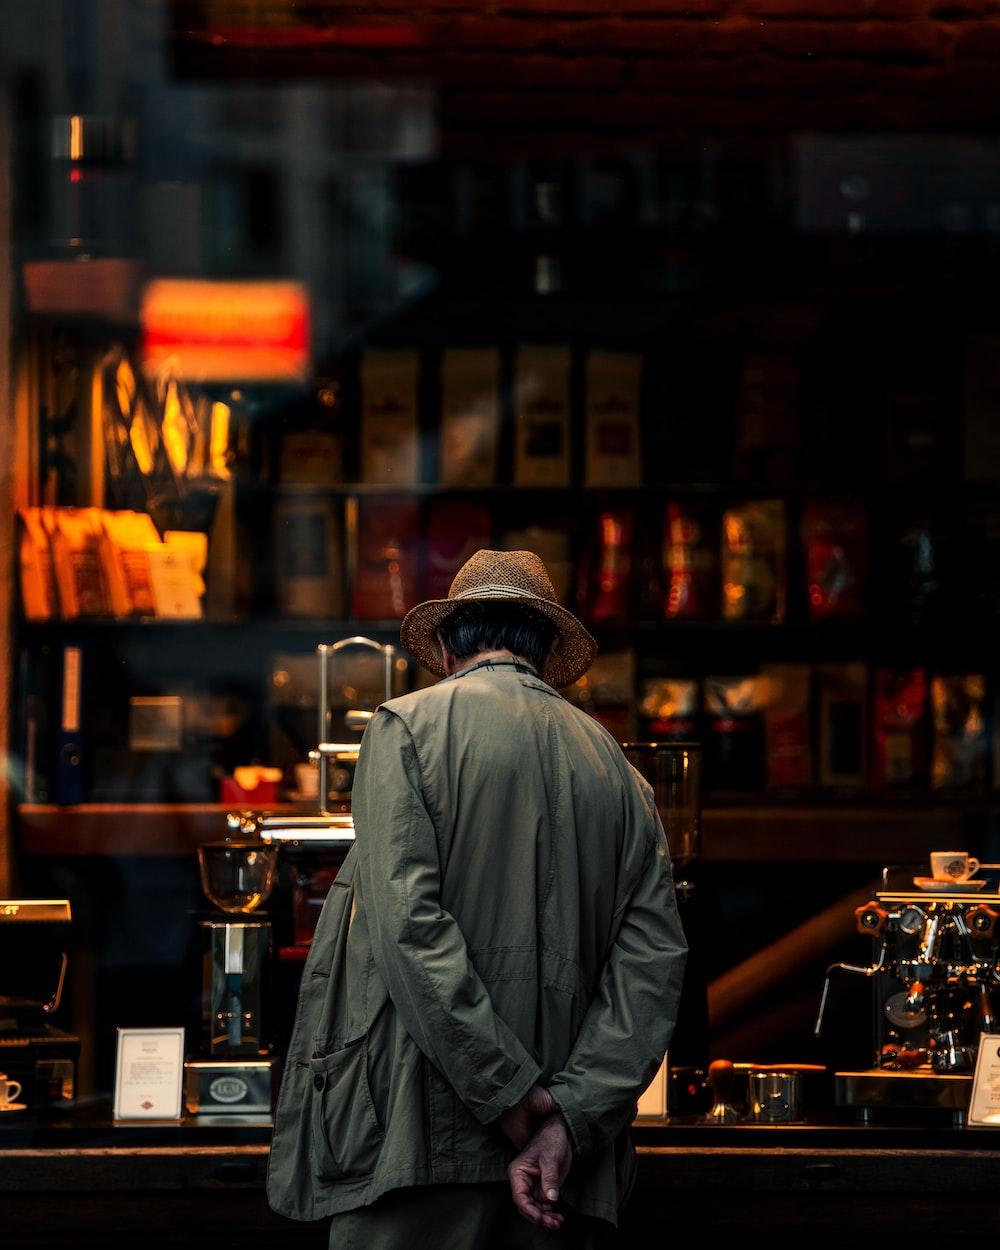 man in gray jacket standing in front of brown wooden shelf